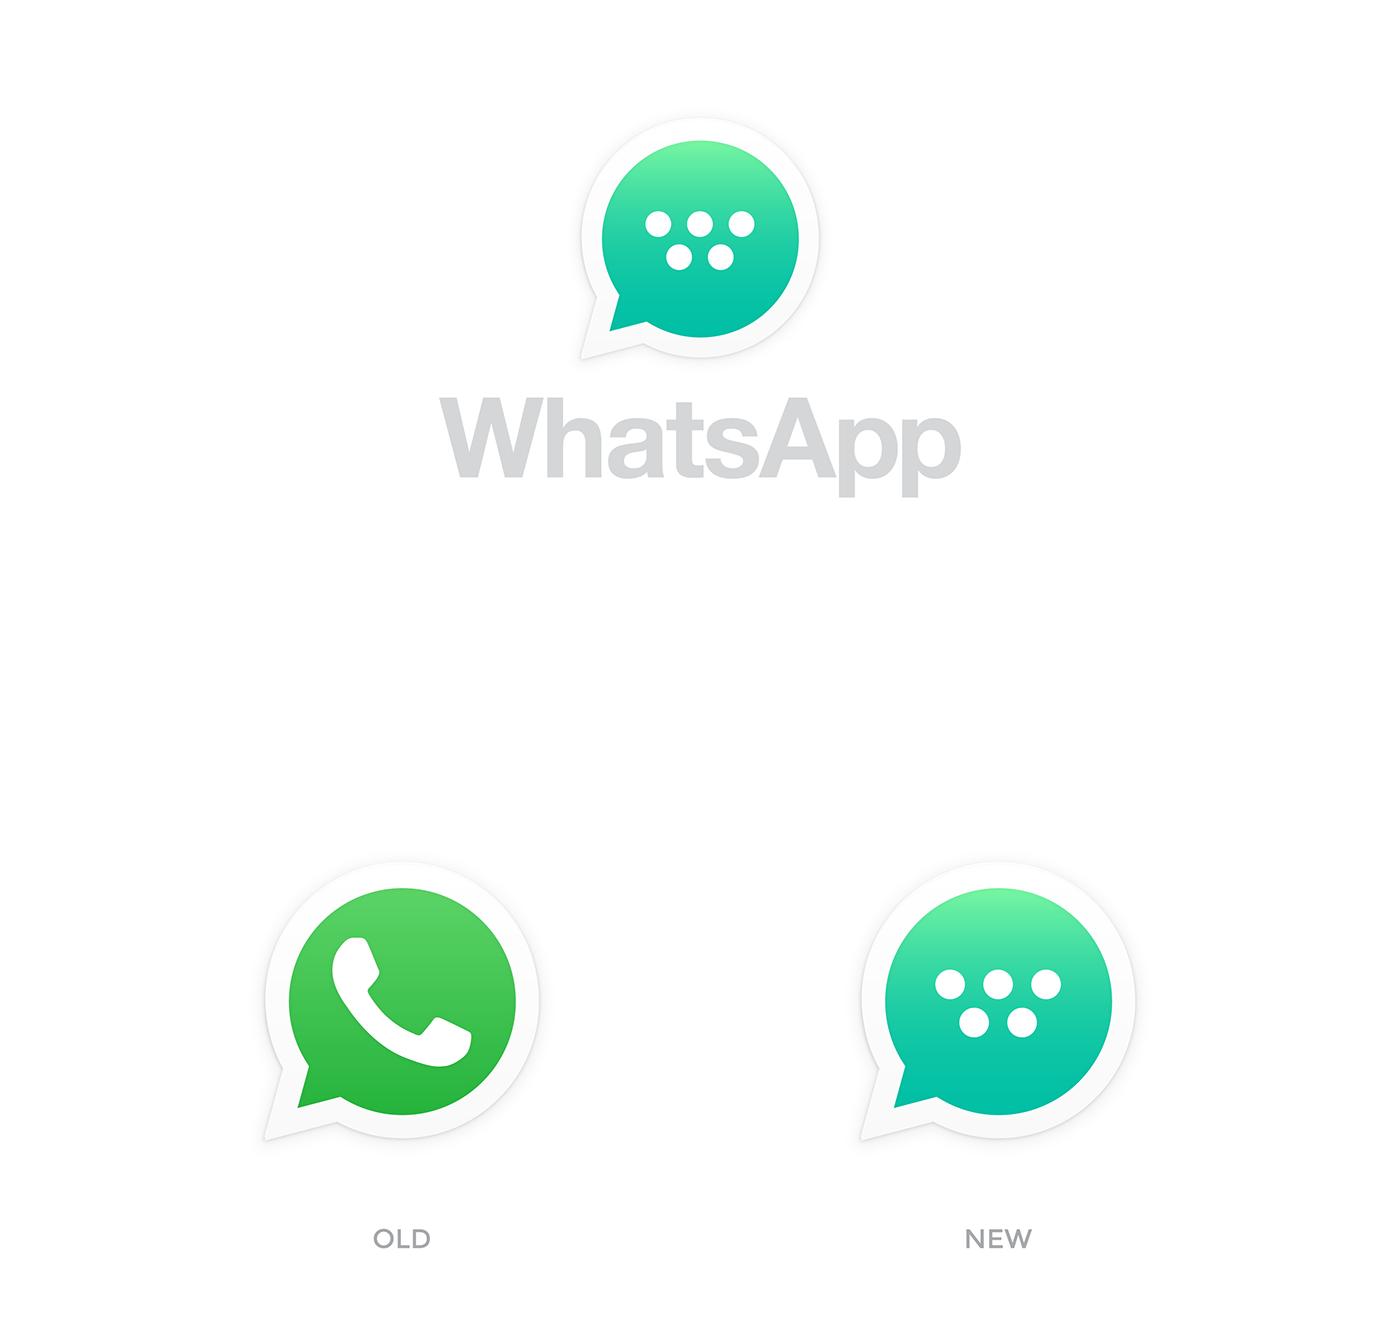 The new WhatsApp on Behance